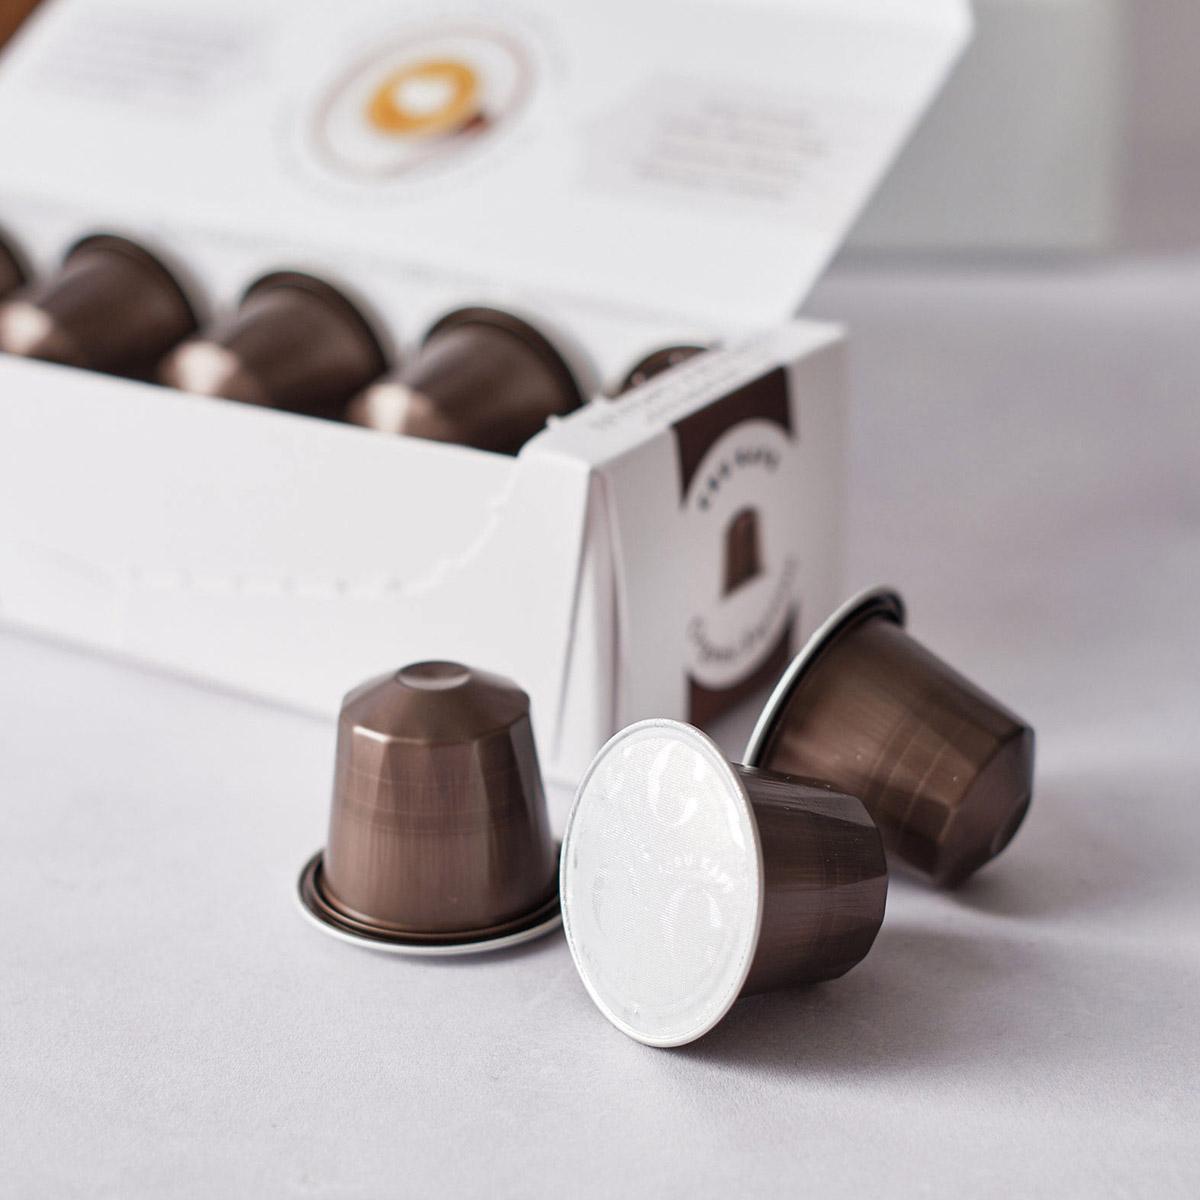 Our Nespresso® Compatible Pods